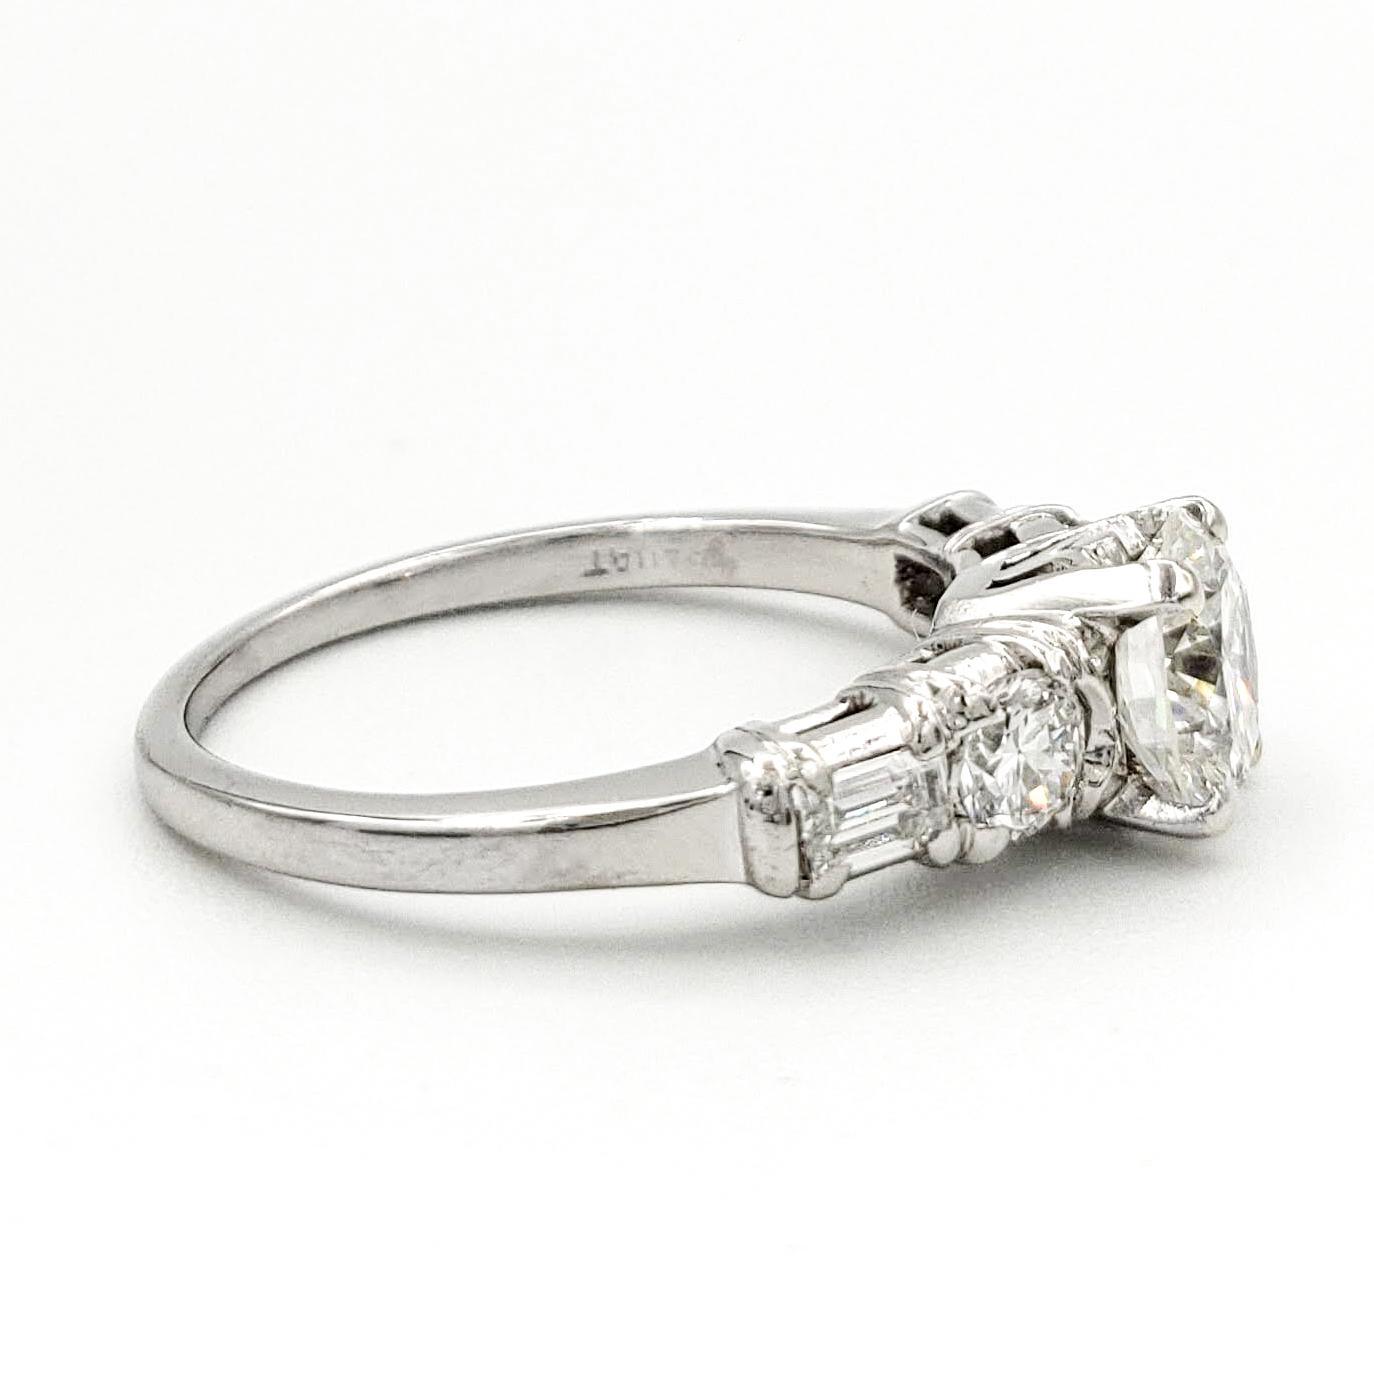 vintage-platinum-engagement-ring-with-0-69-carat-round-brilliant-cut-diamond-egl-g-vvs2